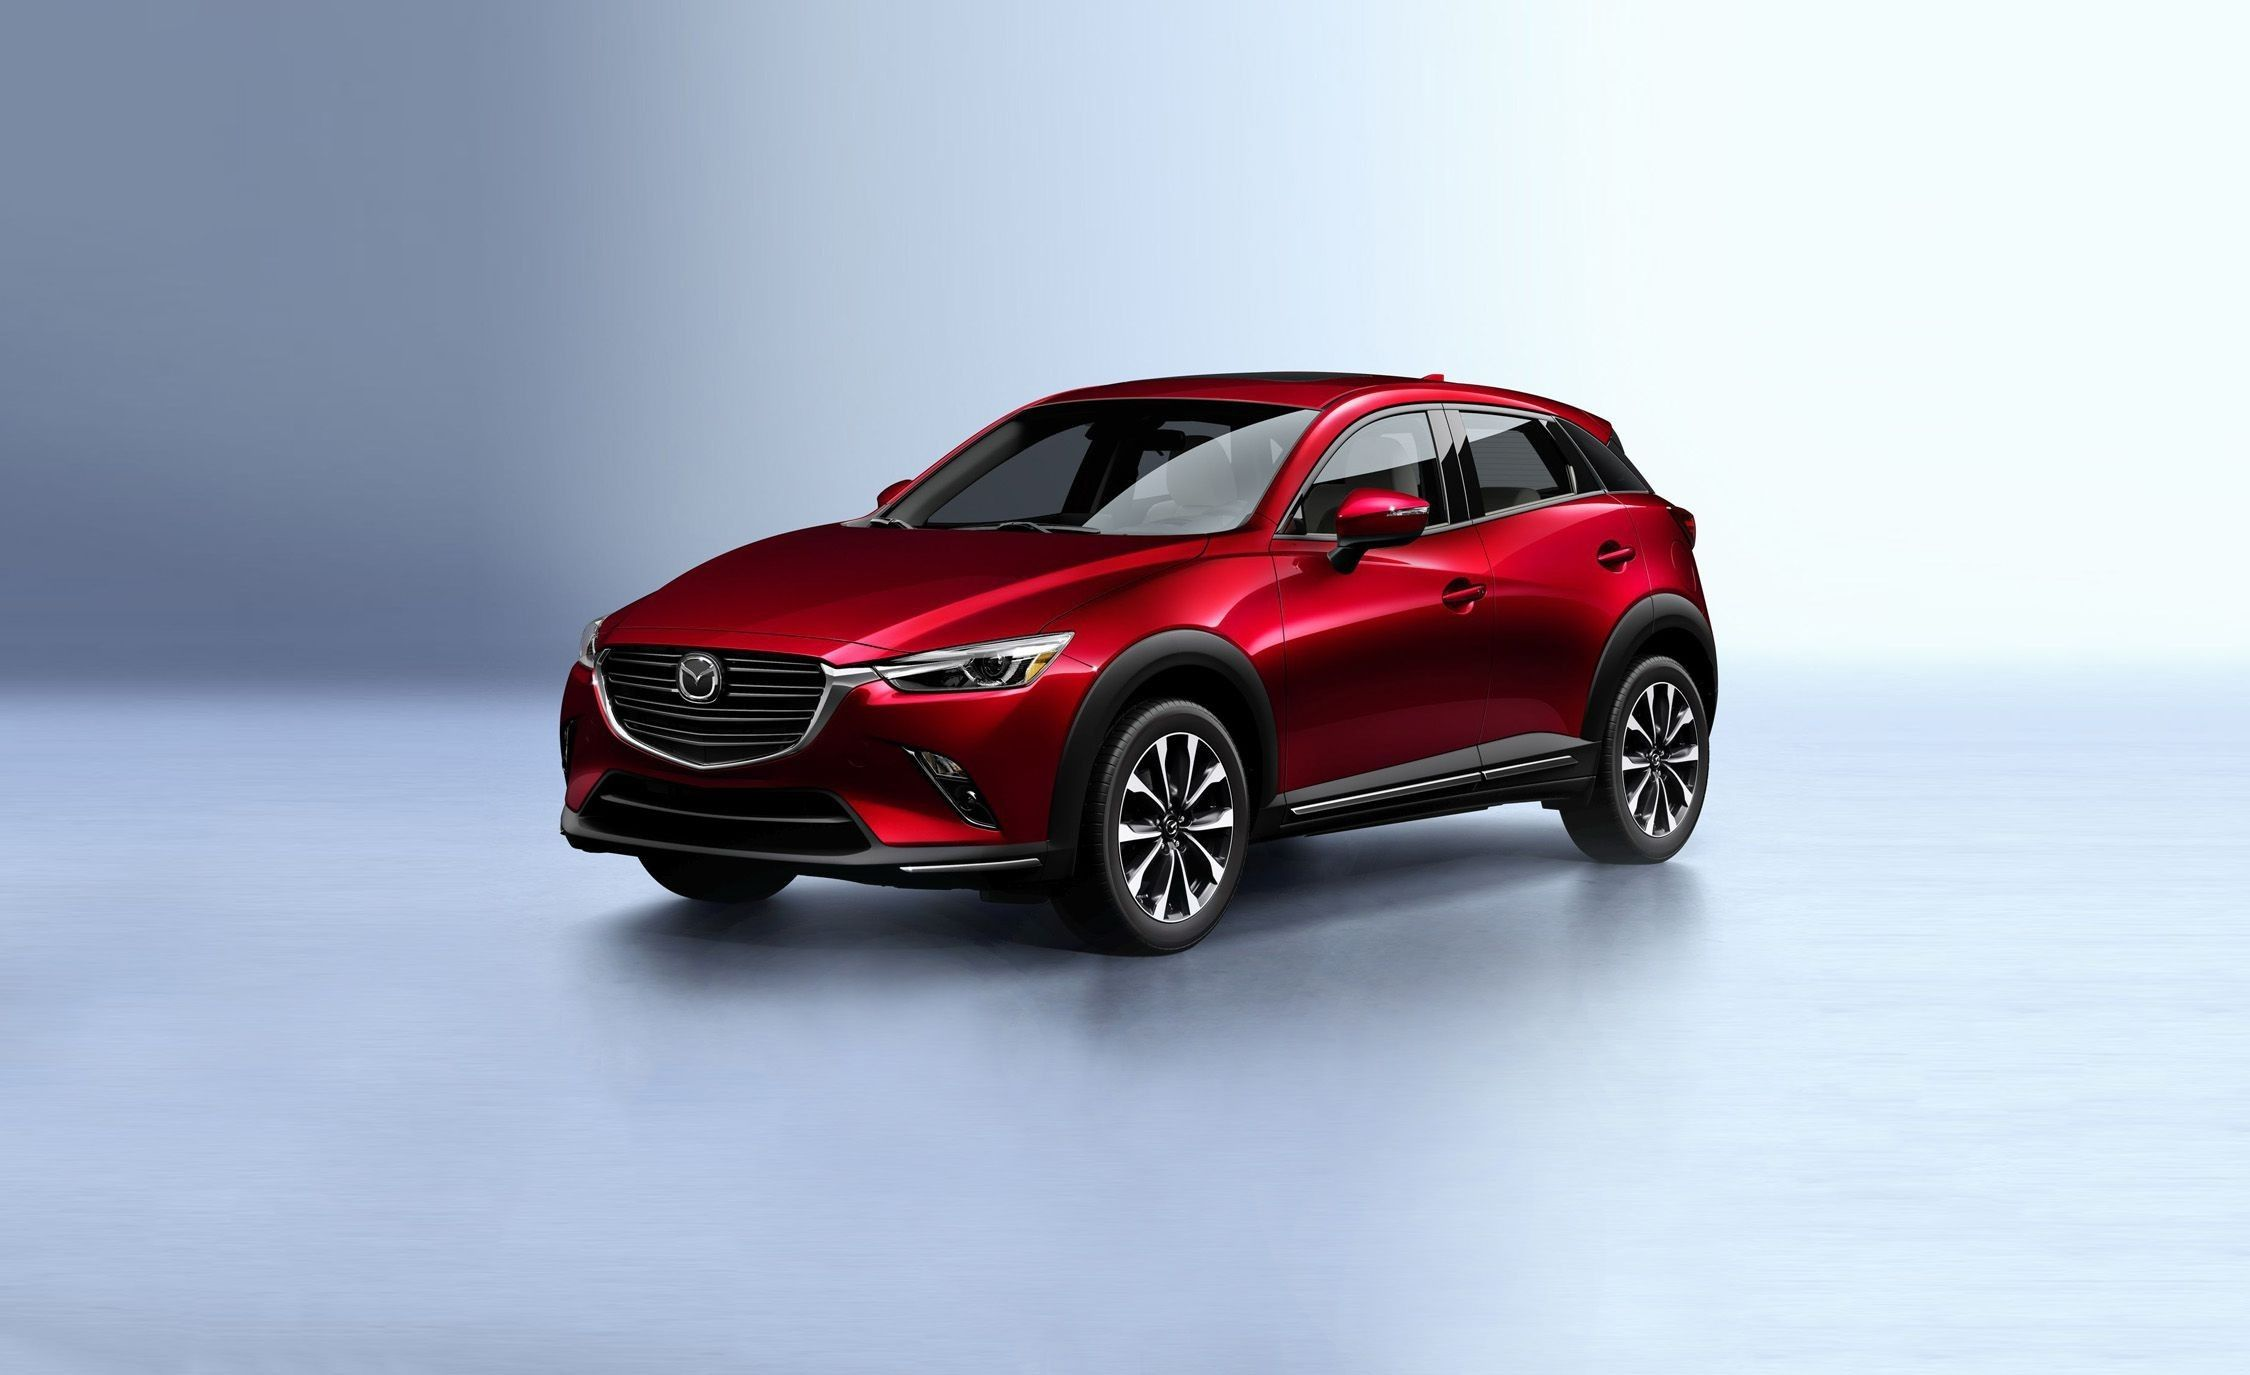 2019 Mazda Cx 3 Mpg First Drive